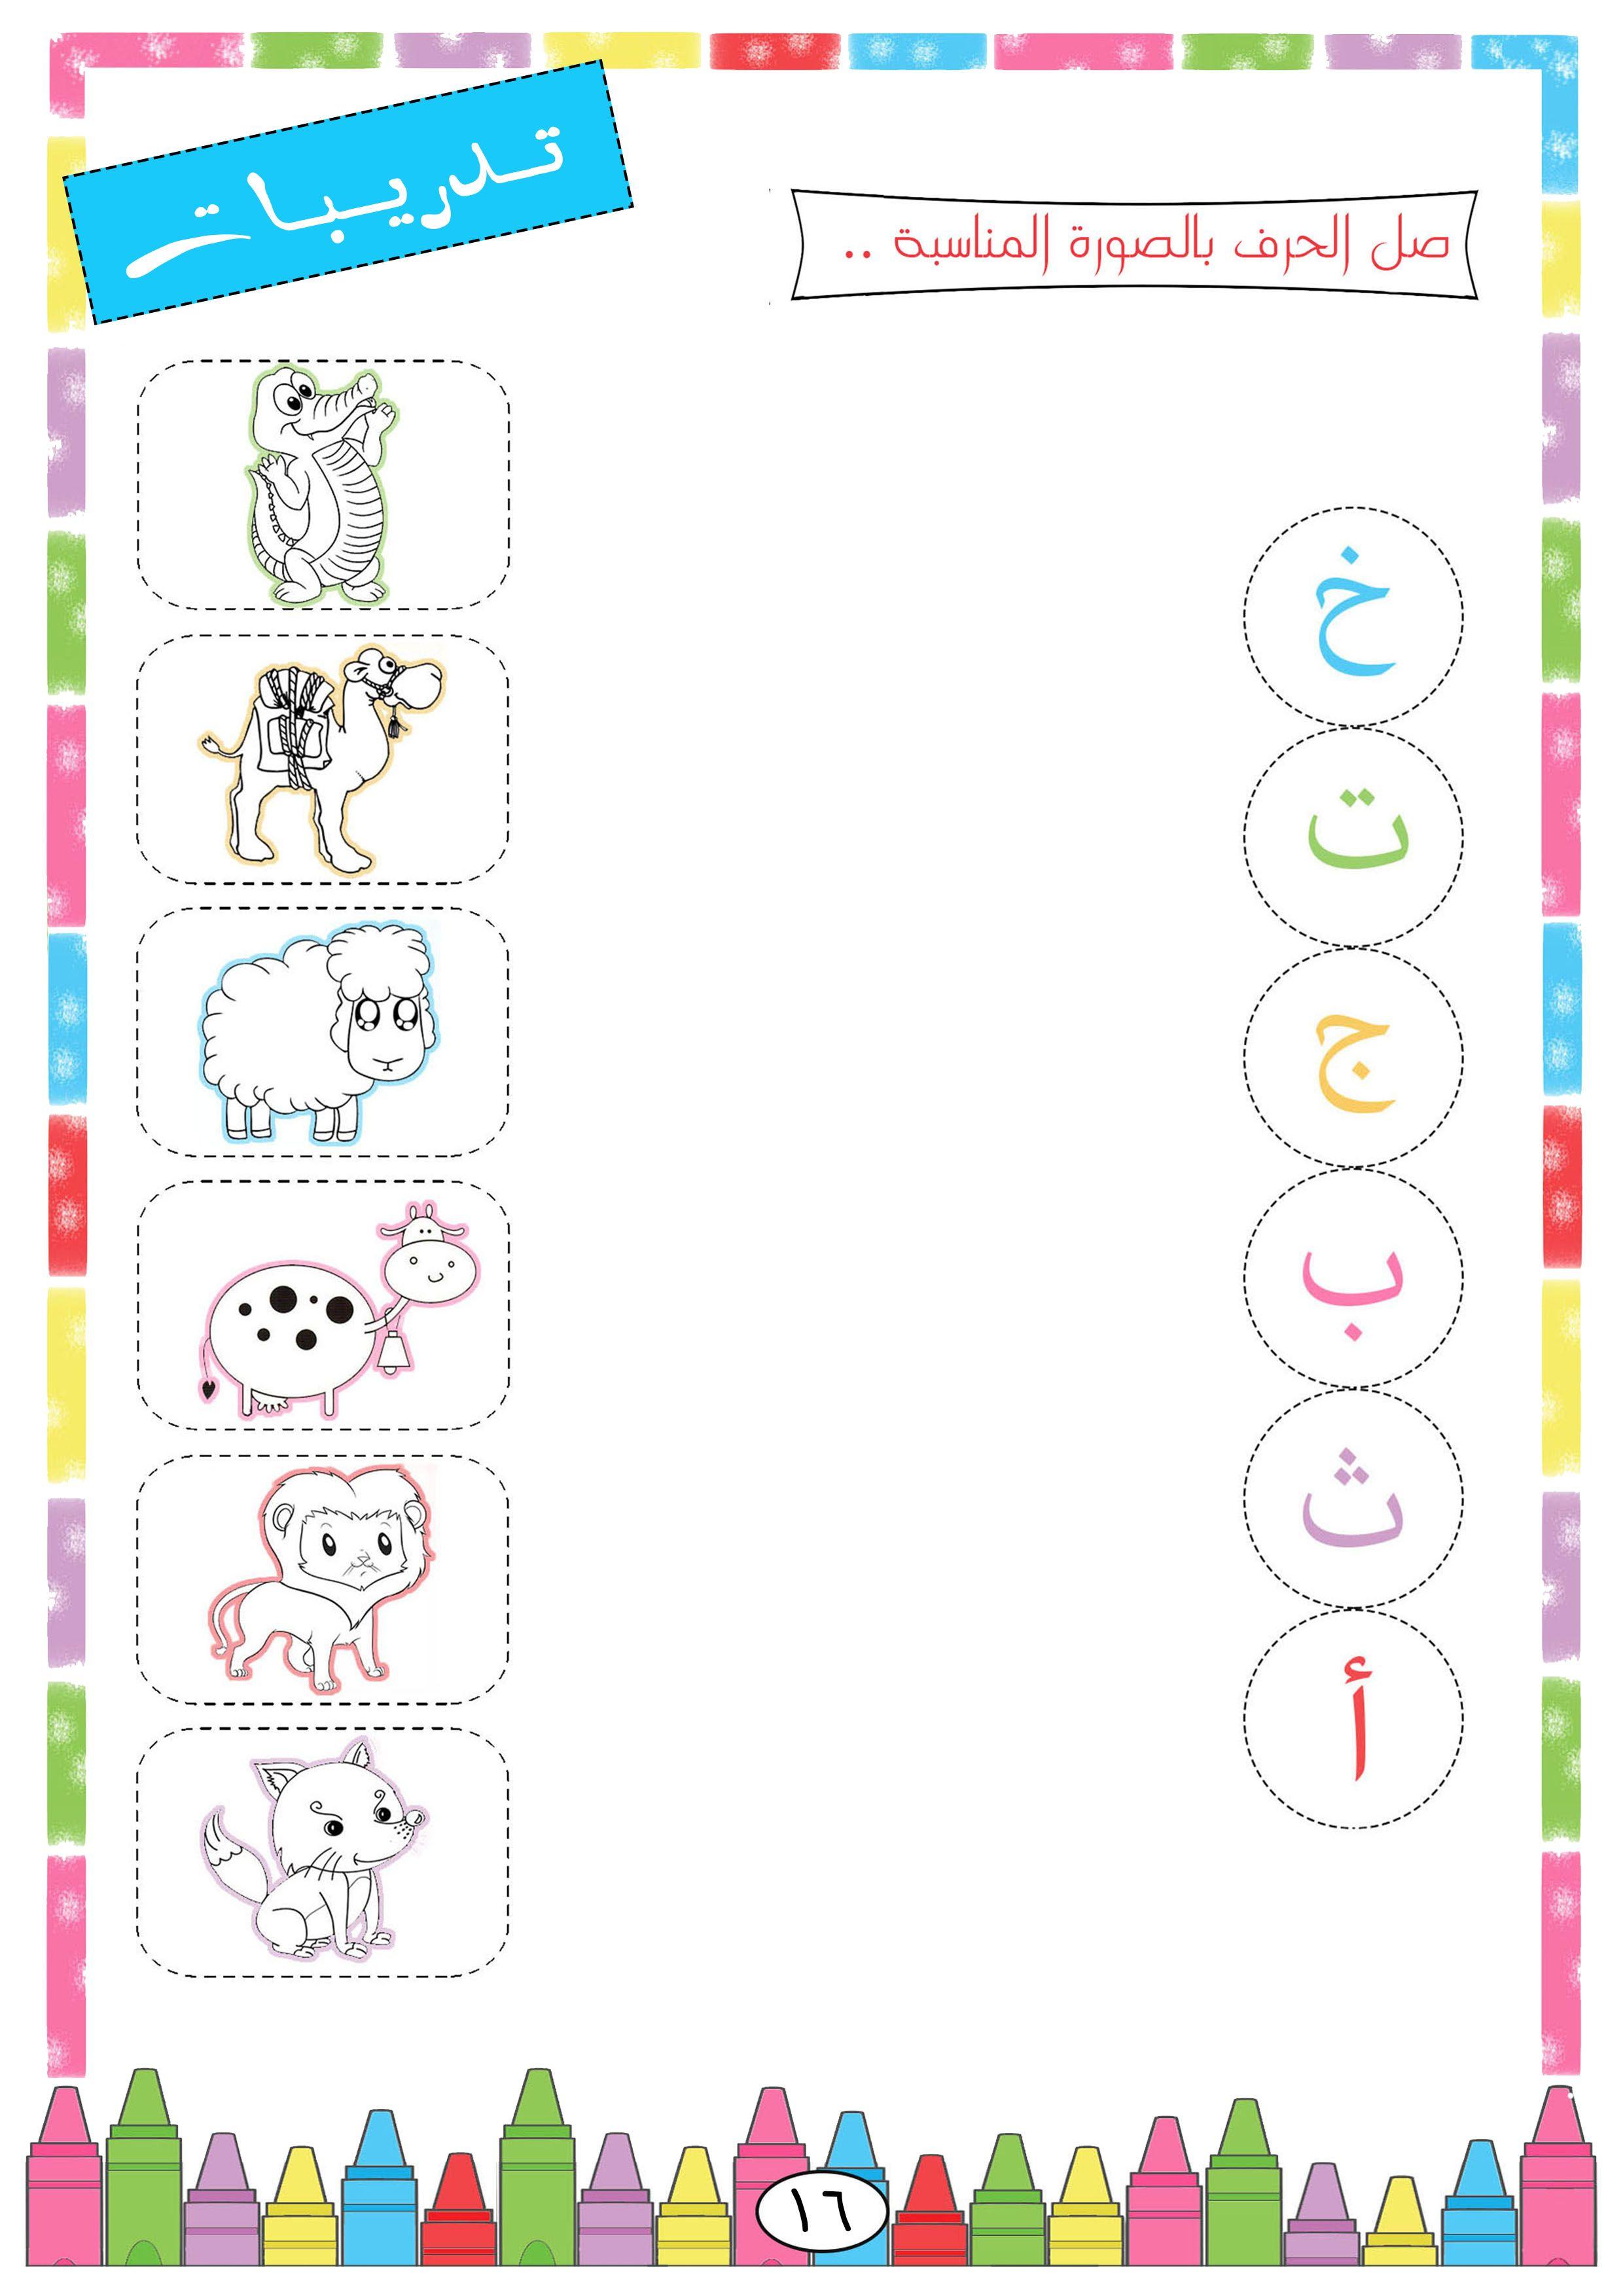 Pin By Elyamama On كتاب ١ Arabic Alphabet For Kids Learning Arabic Arabic Alphabet [ 3508 x 2480 Pixel ]